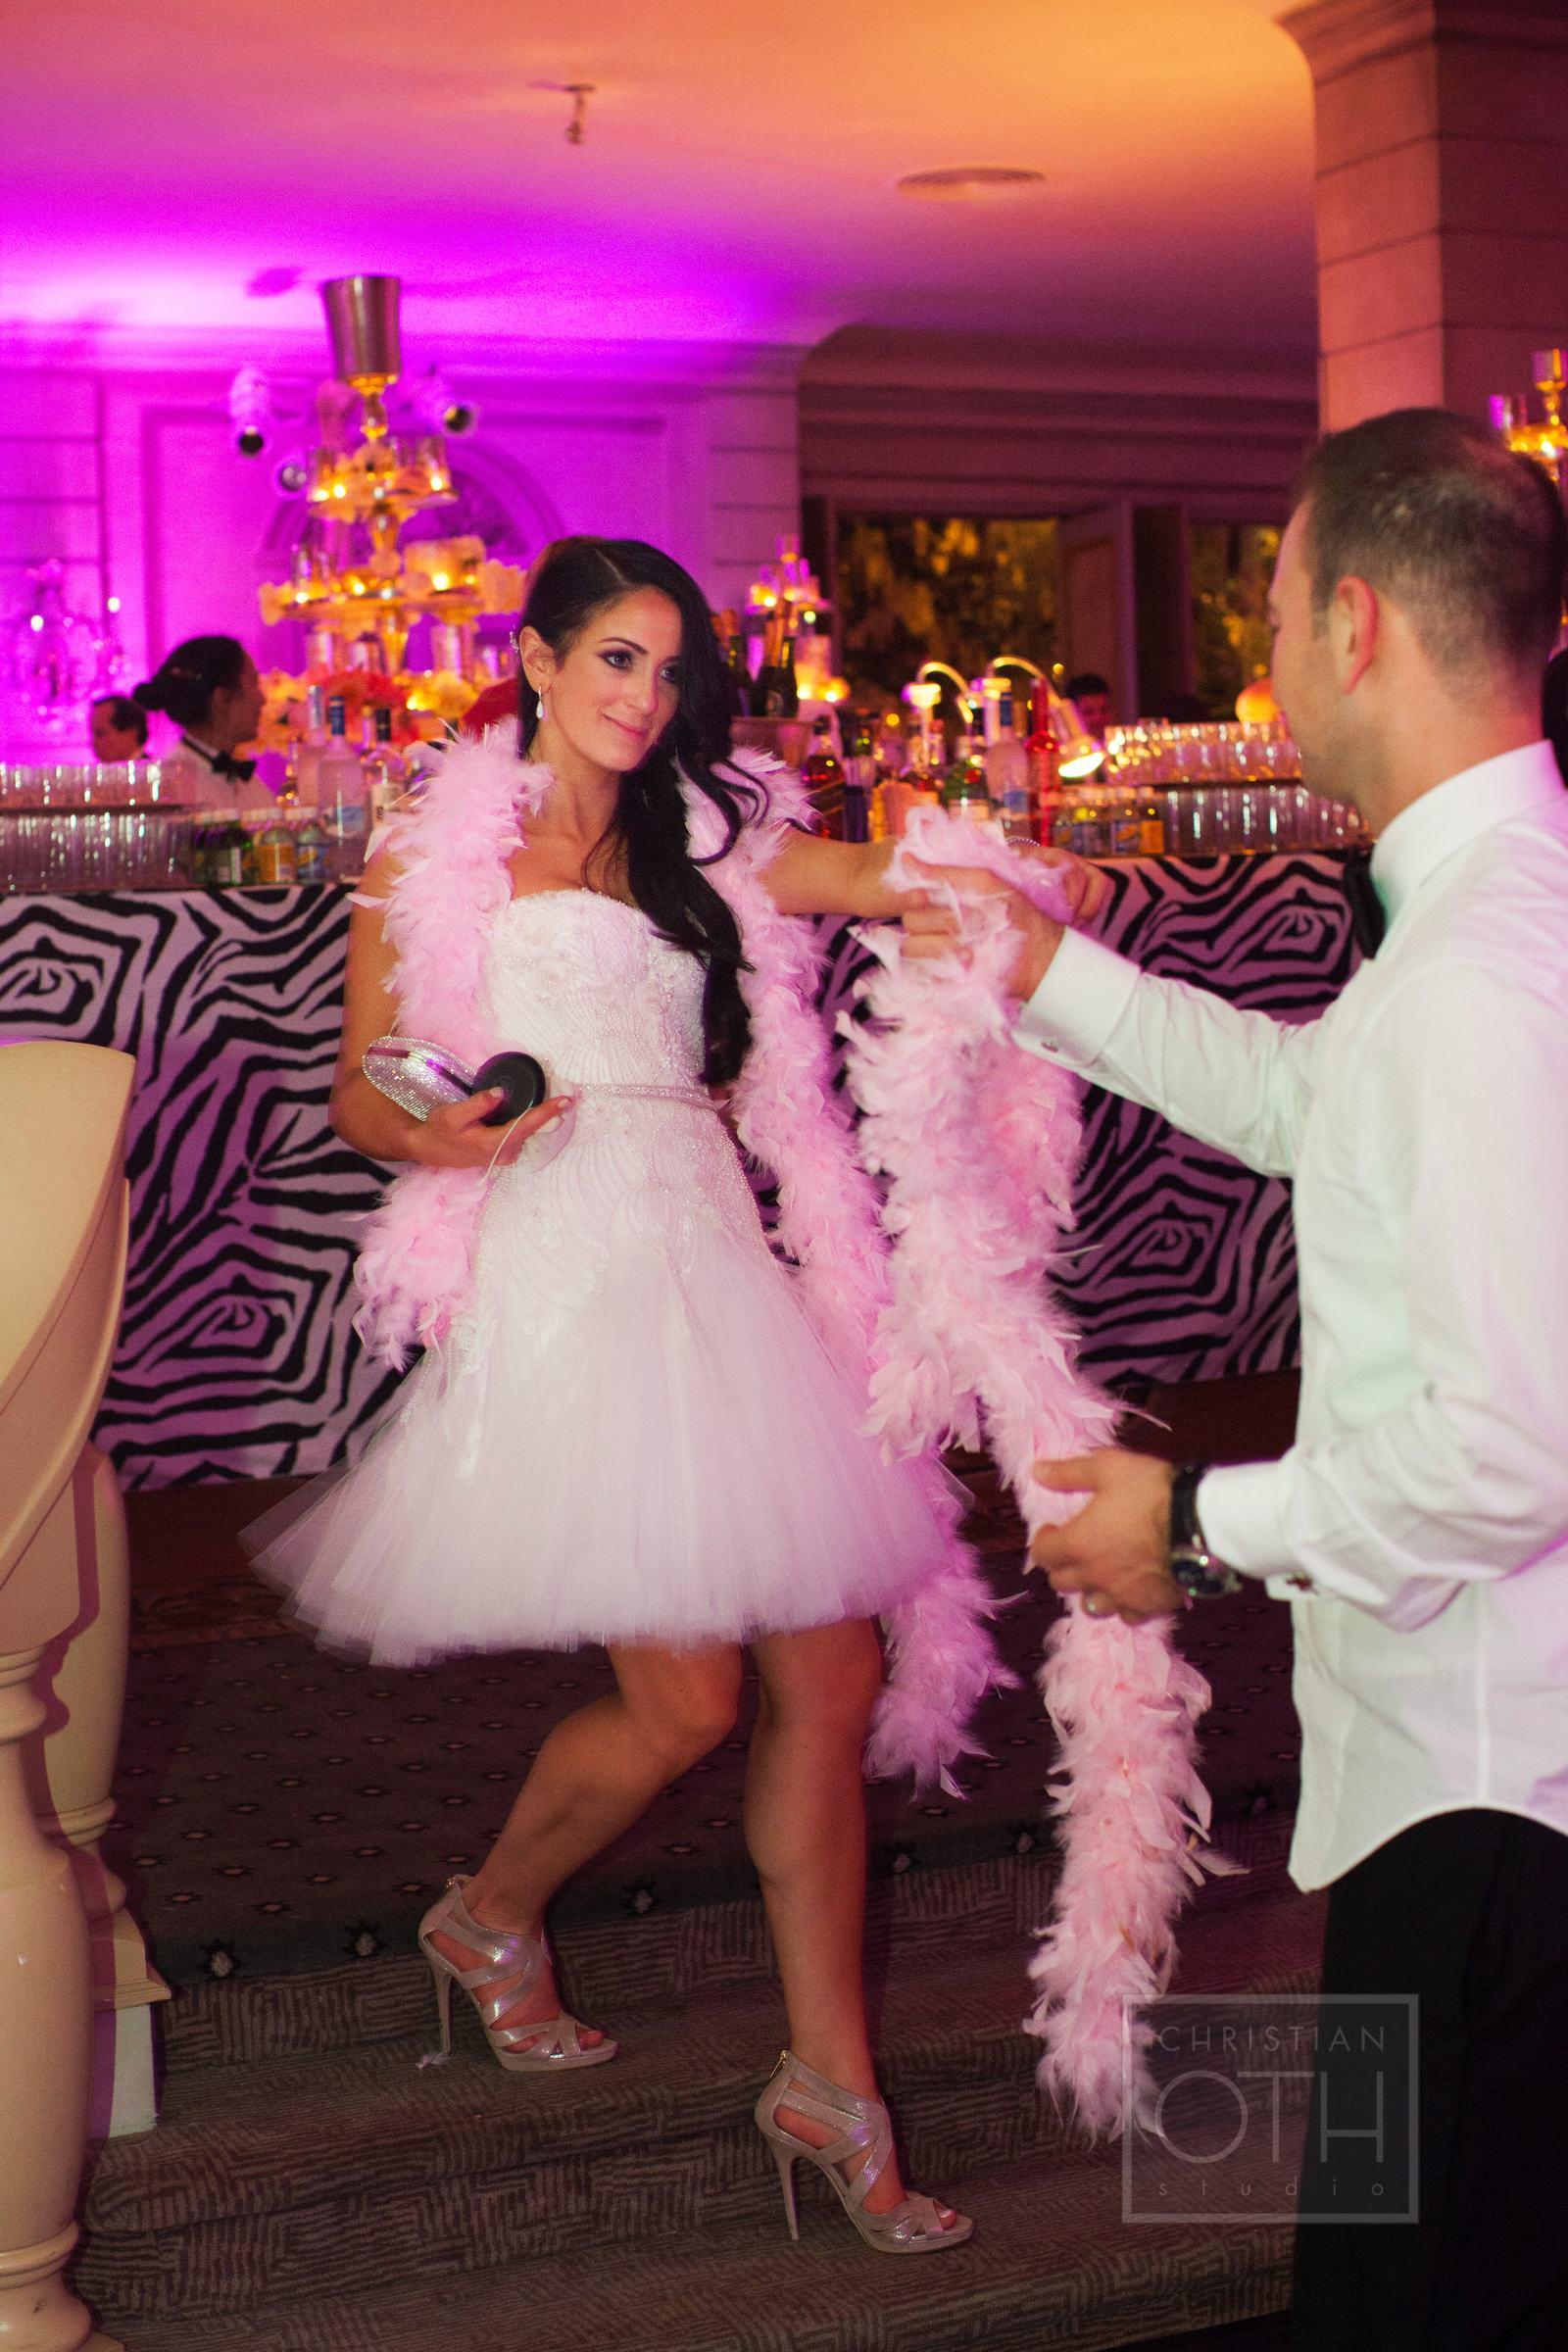 Ceci_New_York_Custom_Invitation_Pierre__City_ Destination_Wedding_Luxury_Personalized_Ceci_Style_Bride_Rose_Gold_Foil_Stamping187.JPG